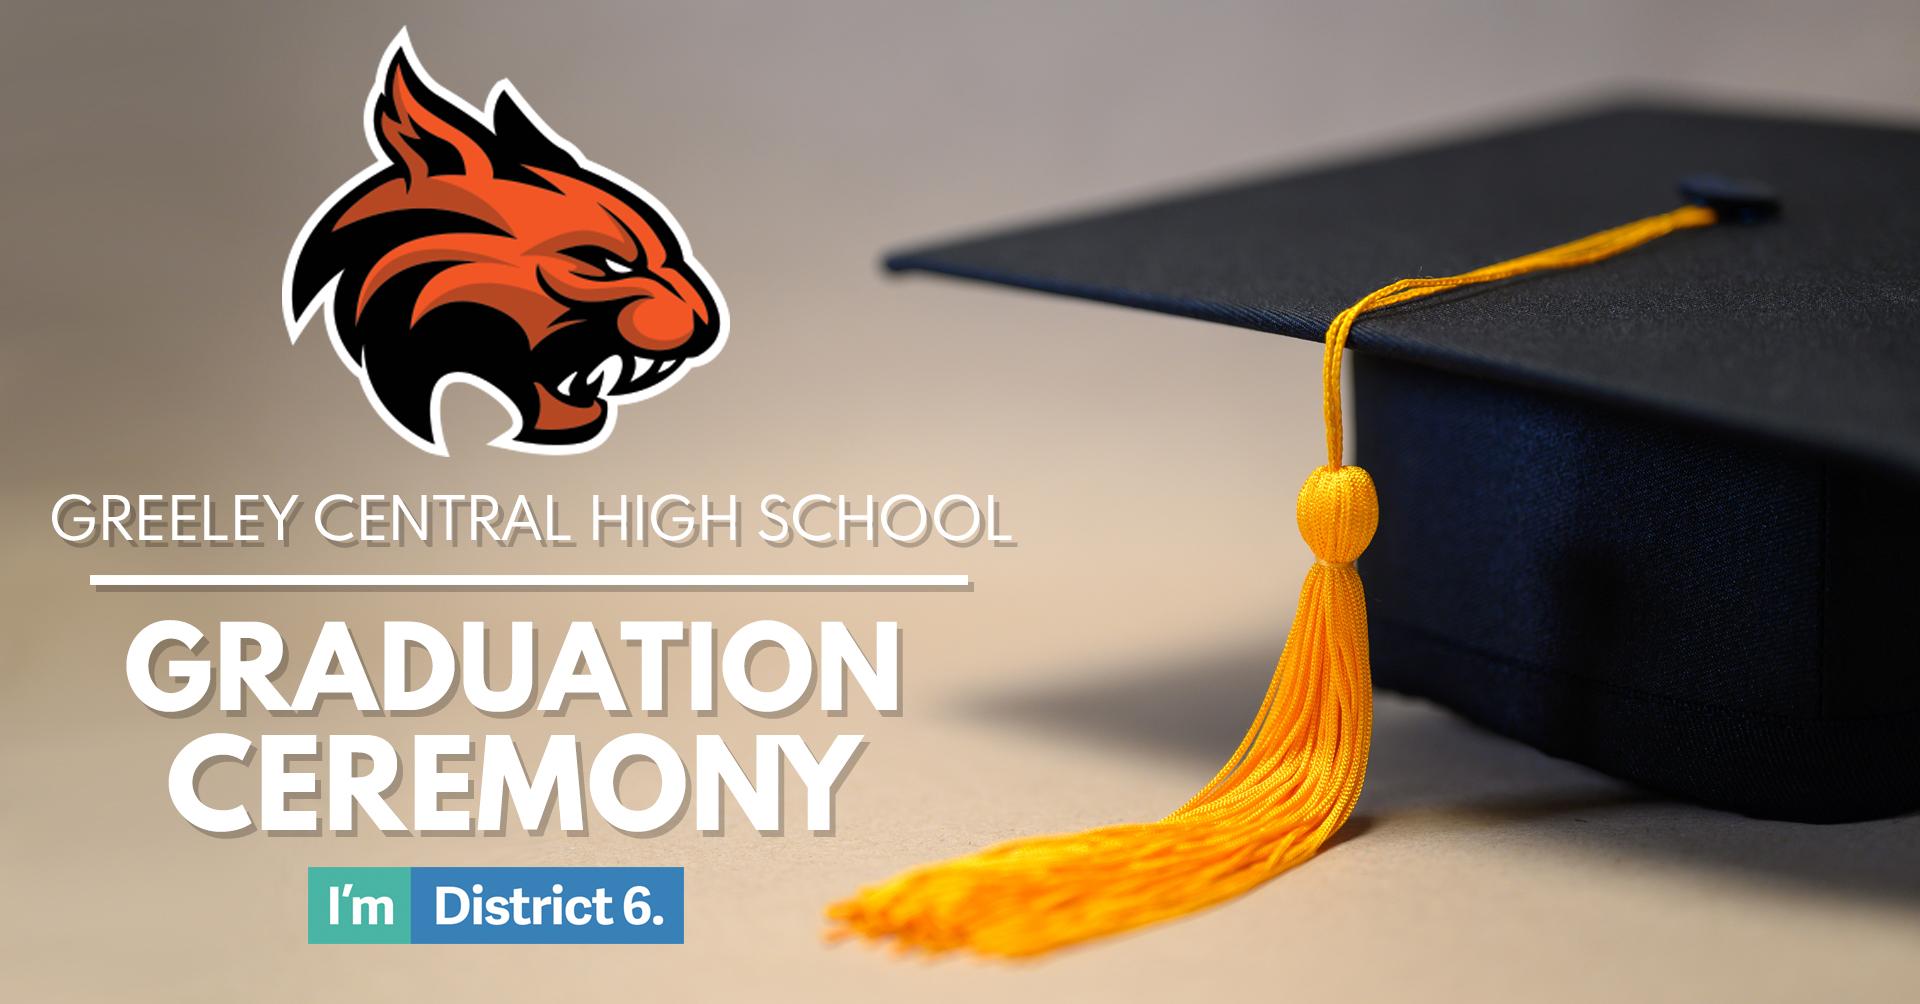 Livestream: Greeley Central High School 2019-2020 Graduation Ceremony 4